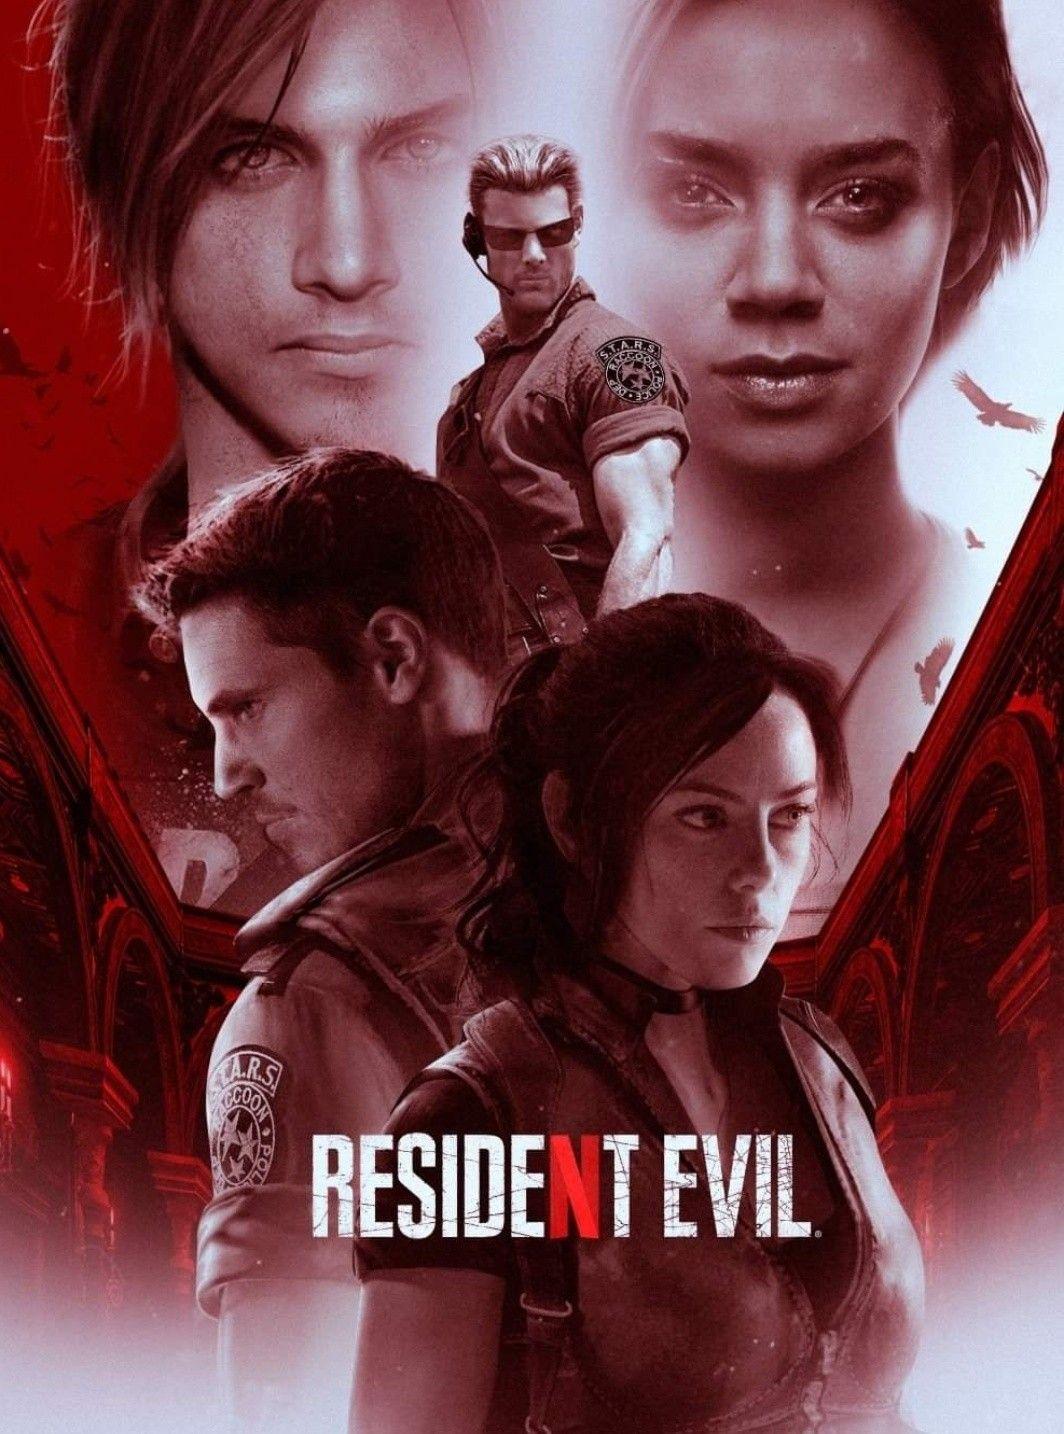 Resident Evil The Tv Series Casting Has Already Begun Netflix Residentevil Netflix Videogames Gam Resident Evil Girl Resident Evil Resident Evil Movie